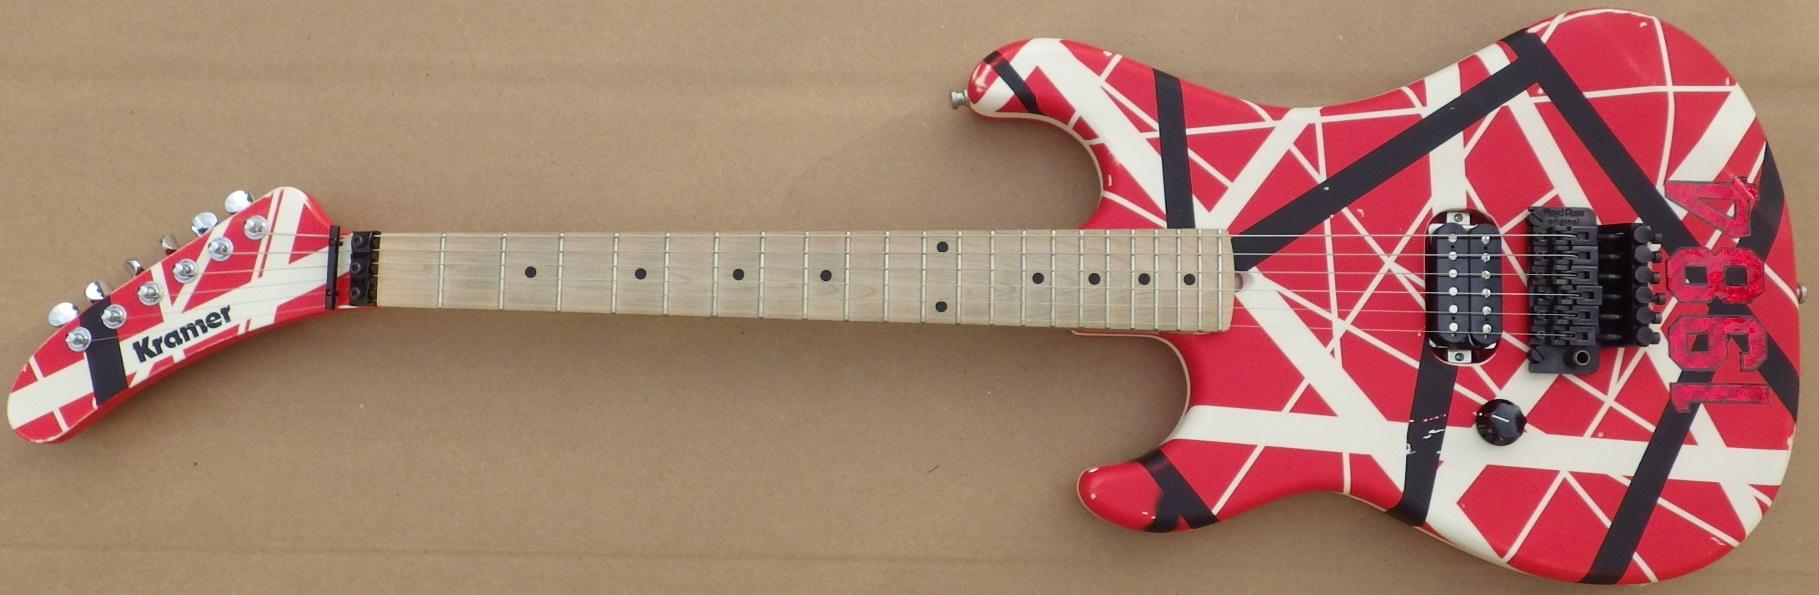 Mean Street paint job over GMW guitar 1984 Juan D pic 1.jpg